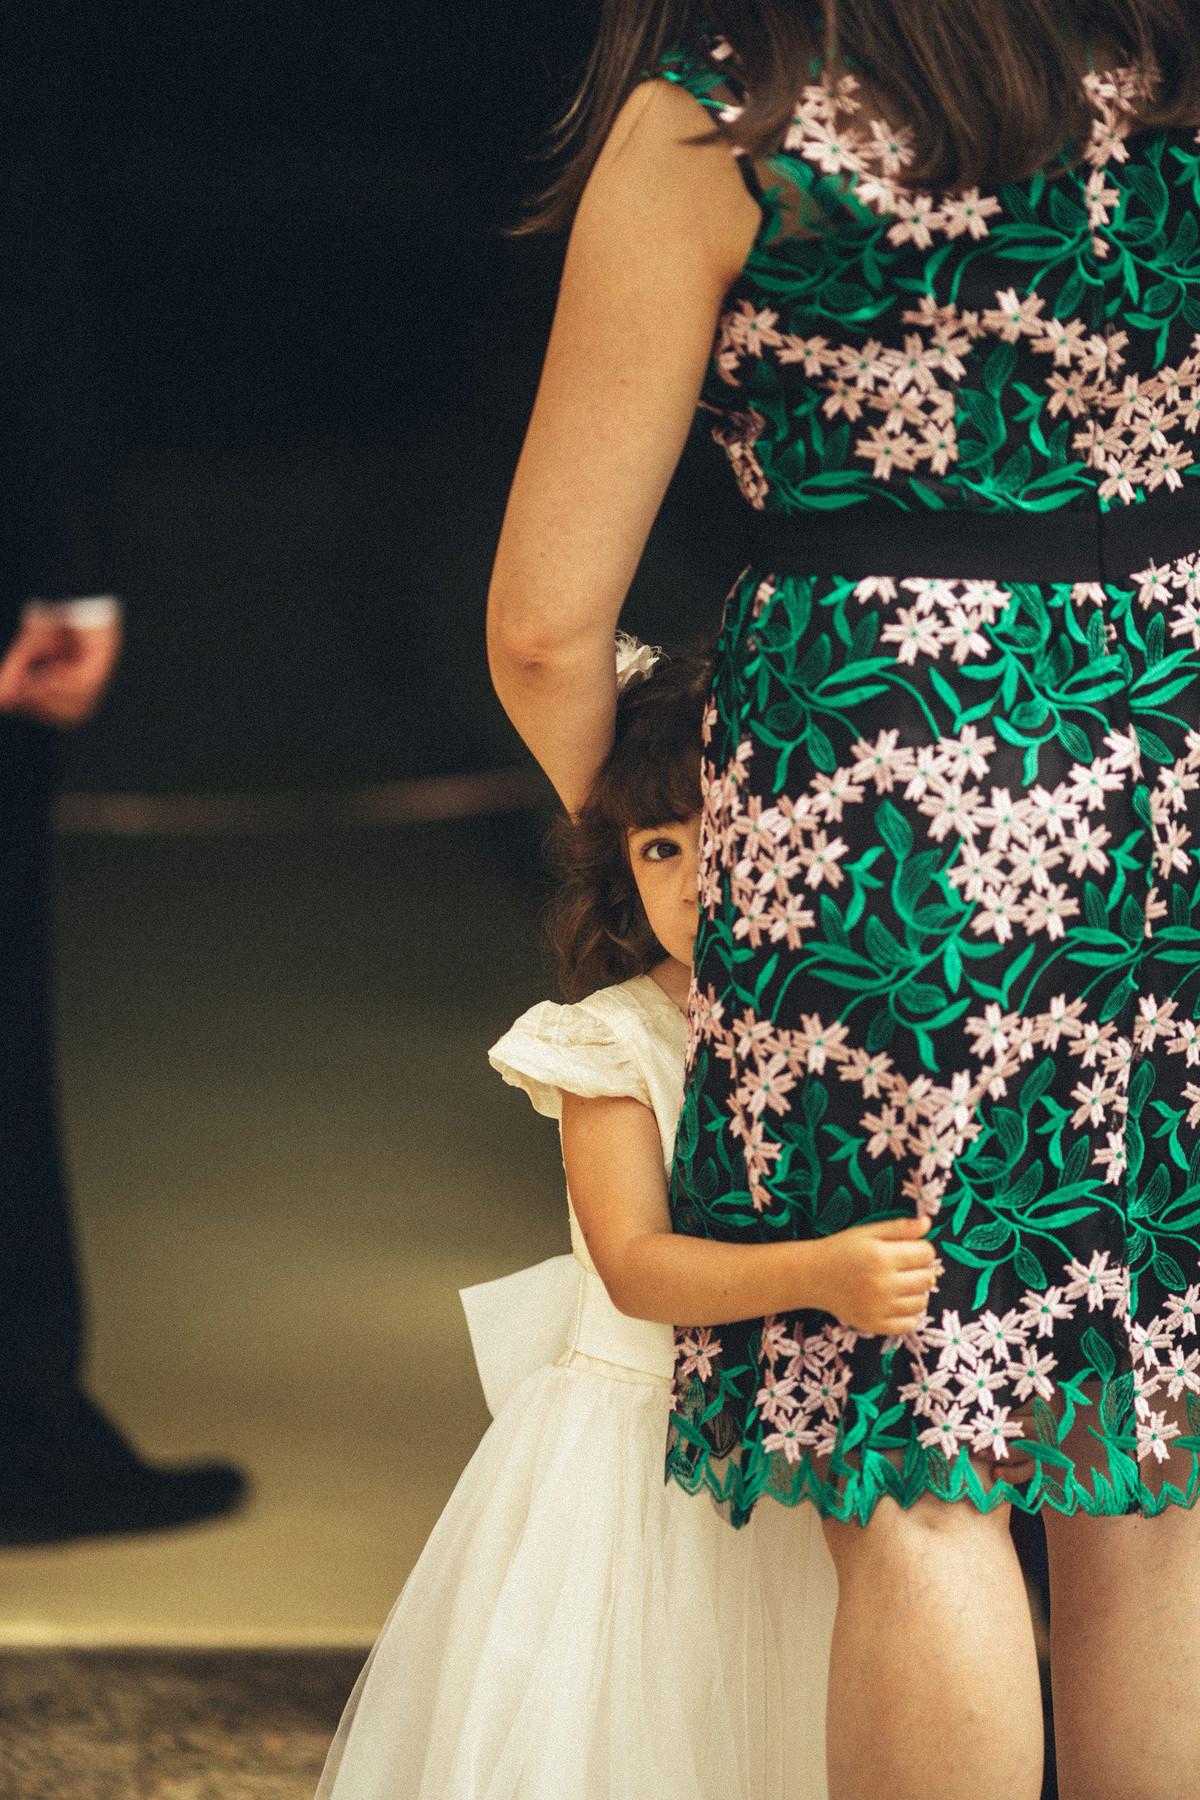 Menina se escondendo atrás da saia da mãe